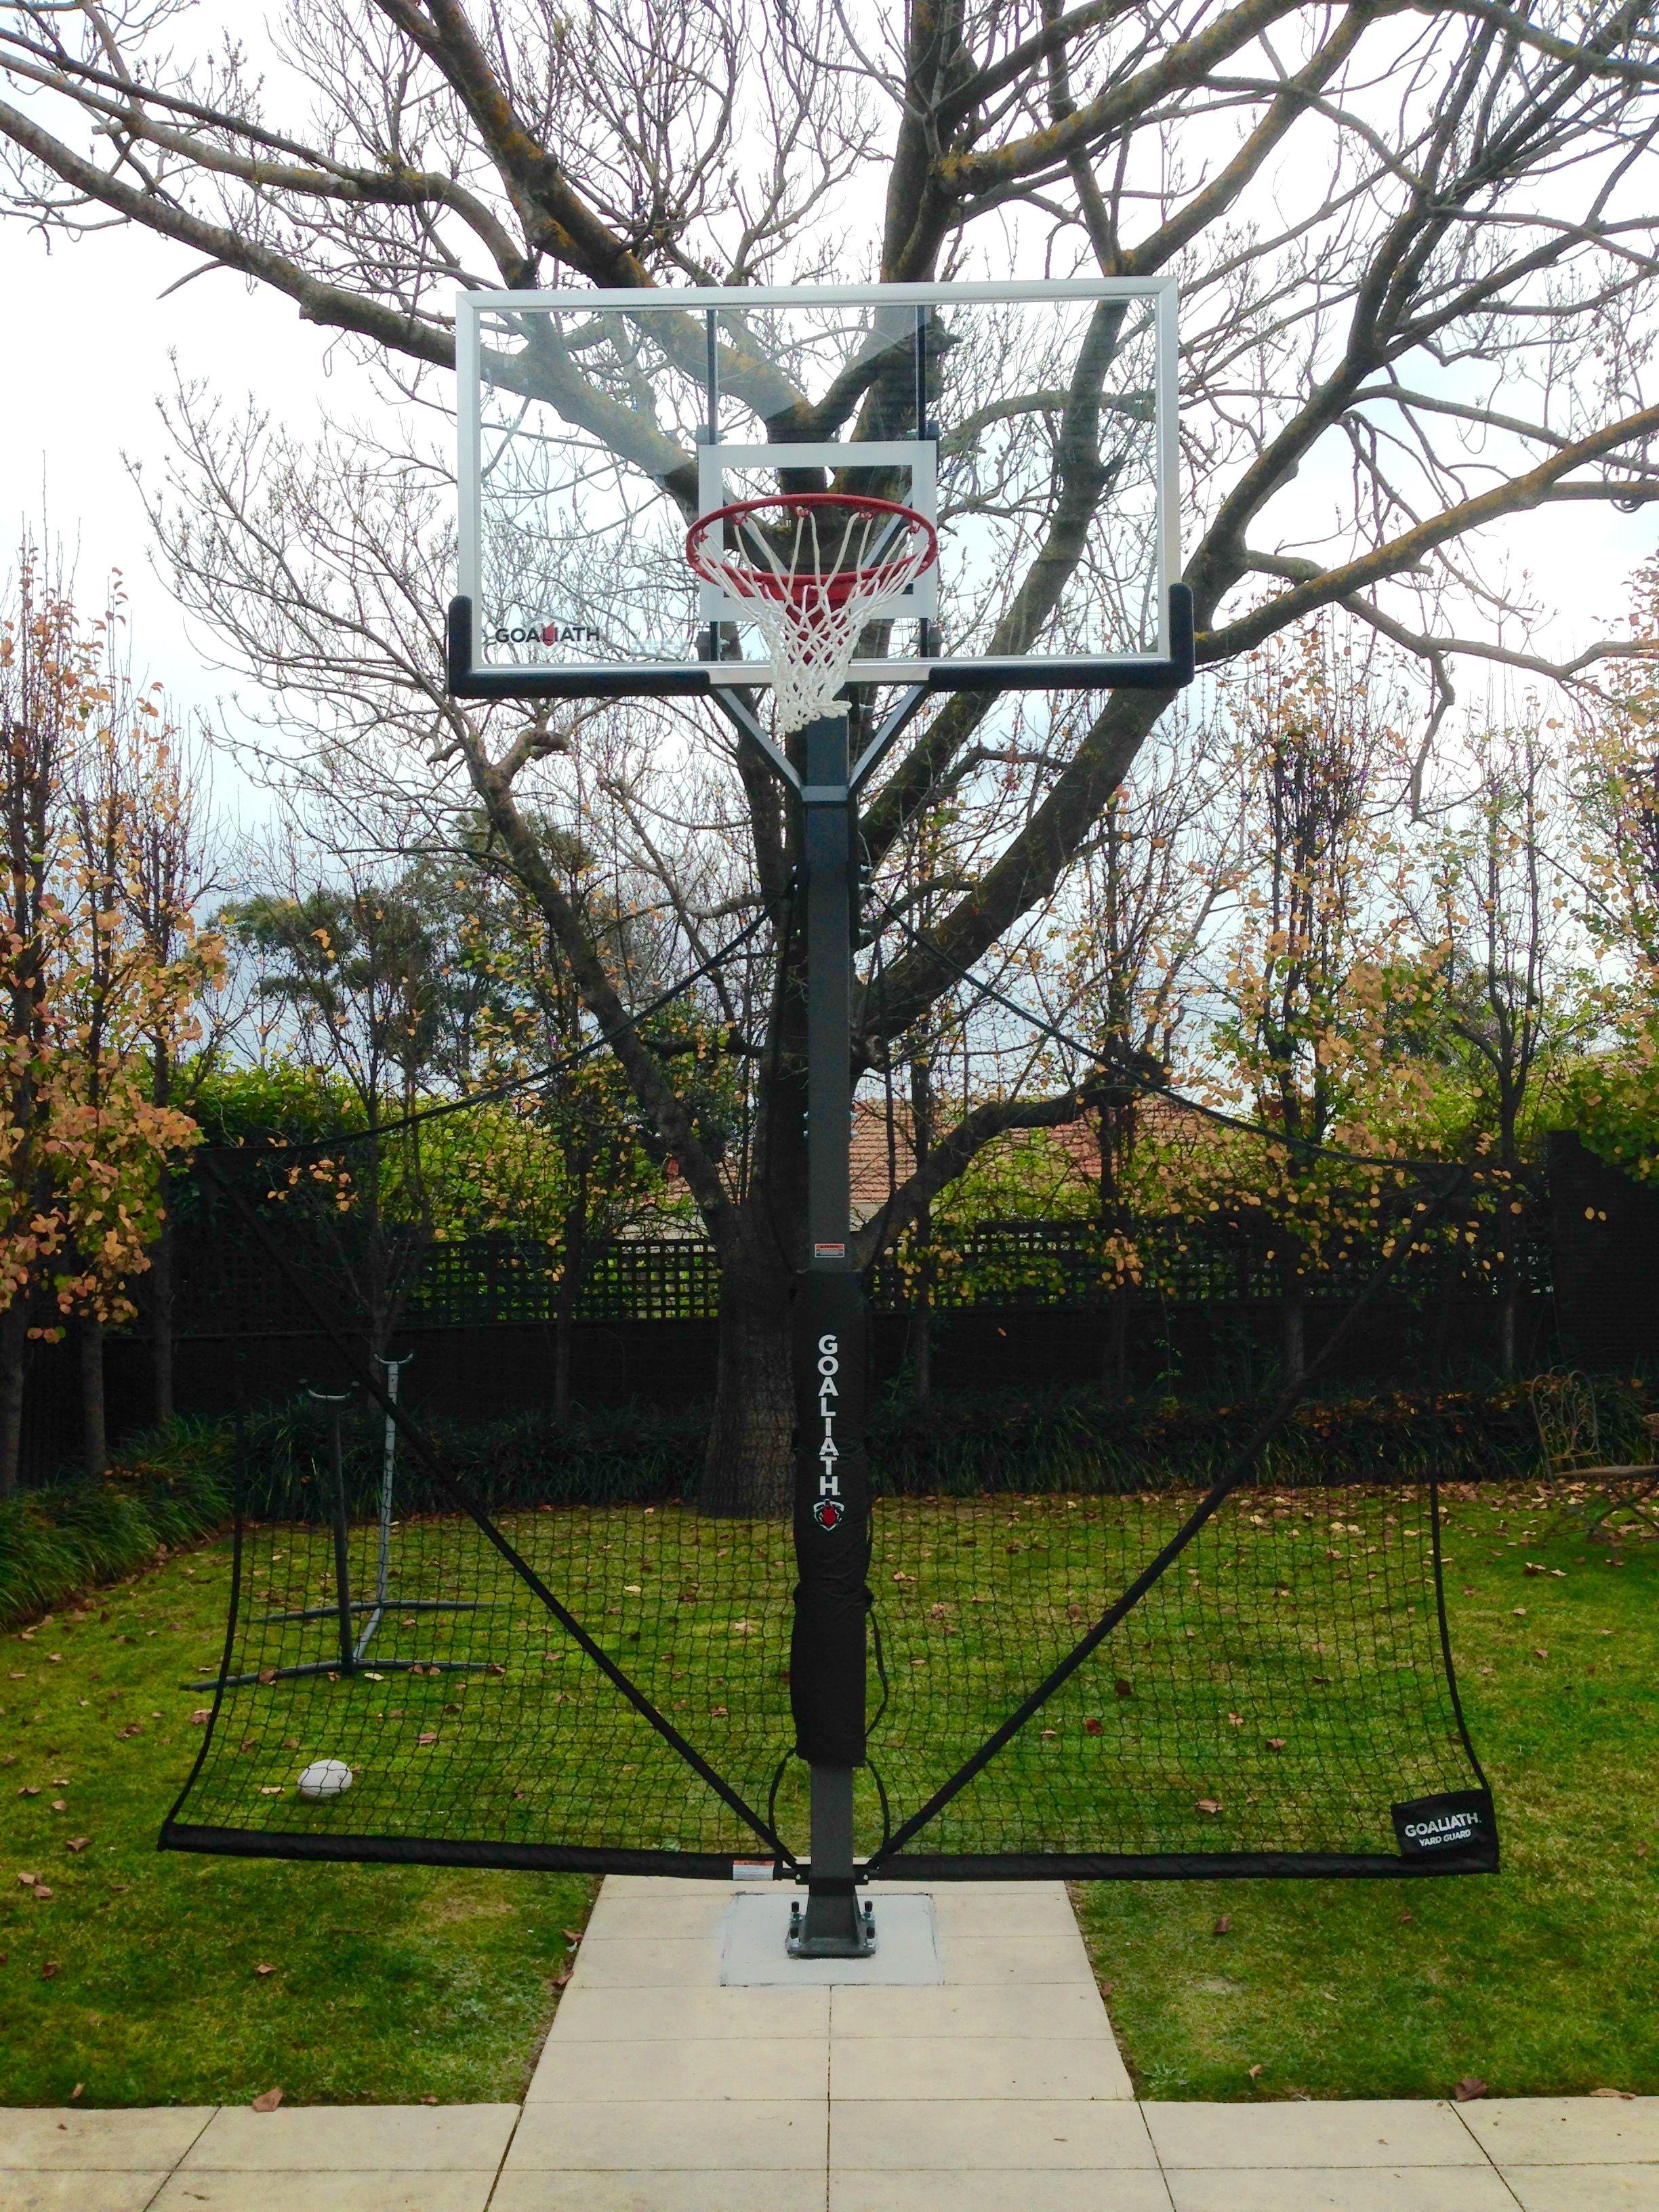 Basketball Gallery Goalrilla Front Yard Basketball Ring Gallery